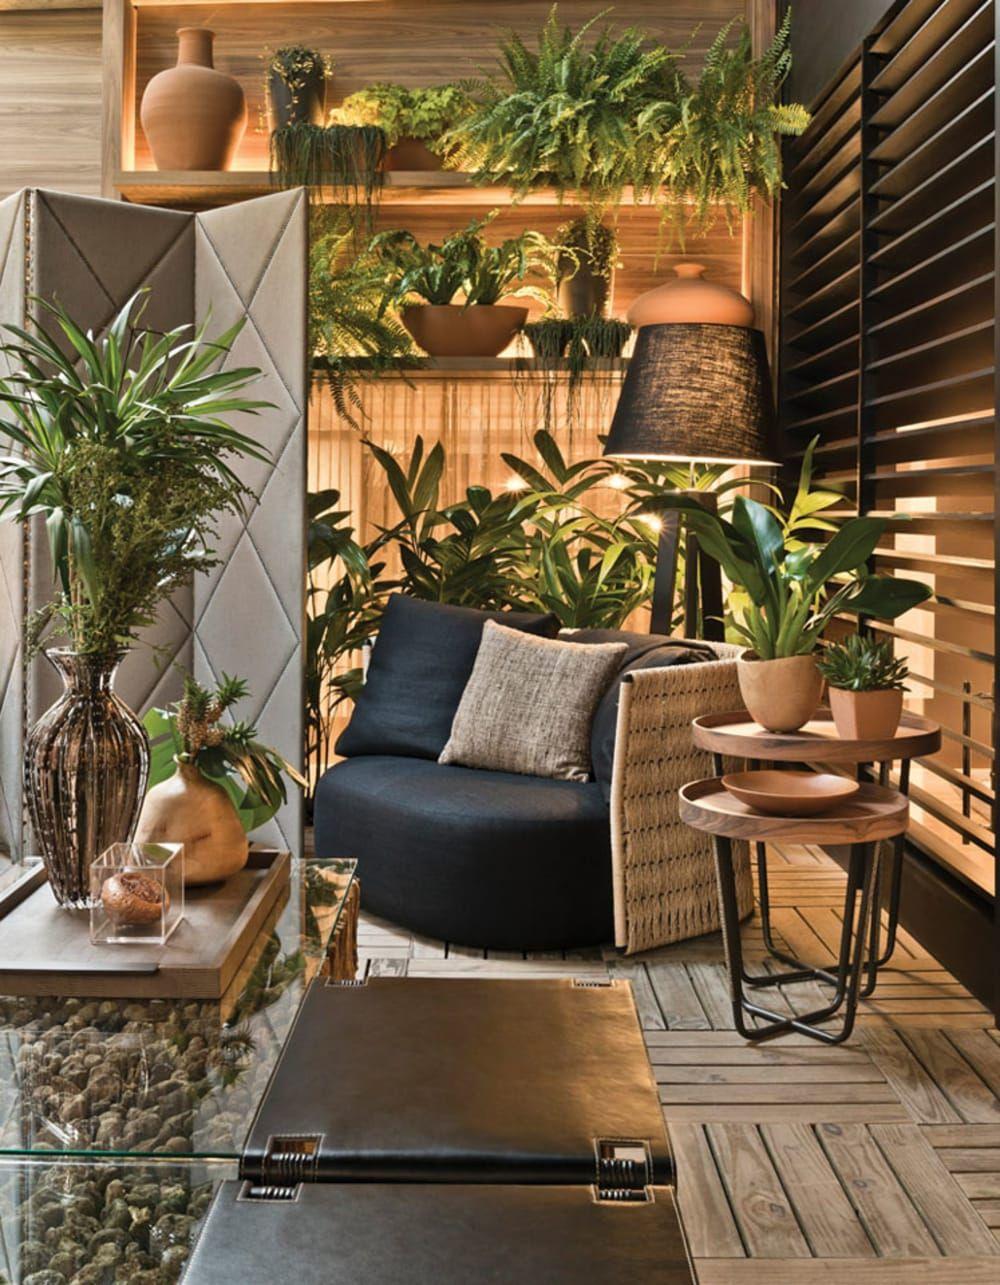 Biophilic Sustainable Interior Design Garden Room A New Take On Biophilic Design Dfordesign Indoor Garden Rooms Interior Garden Zen Interiors